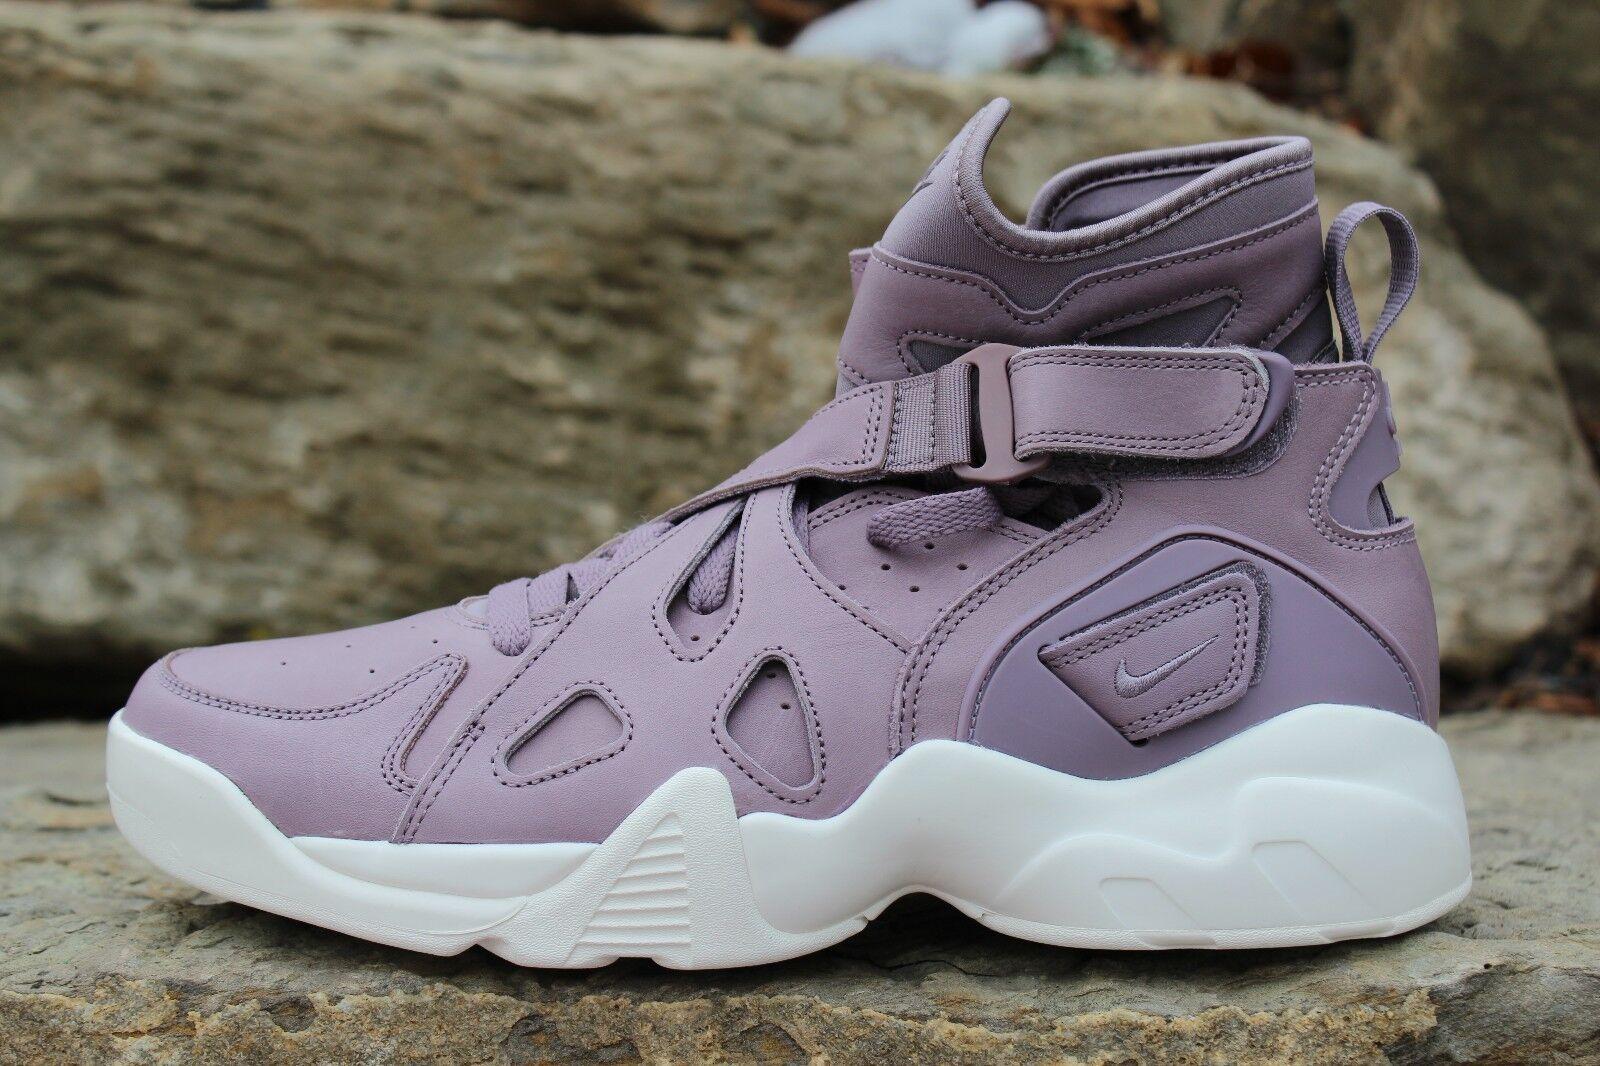 13 New Nike Air Unlimited NikeLab Purple Smoke Size Men's Shoes 854318 551 Size Smoke 10 547356